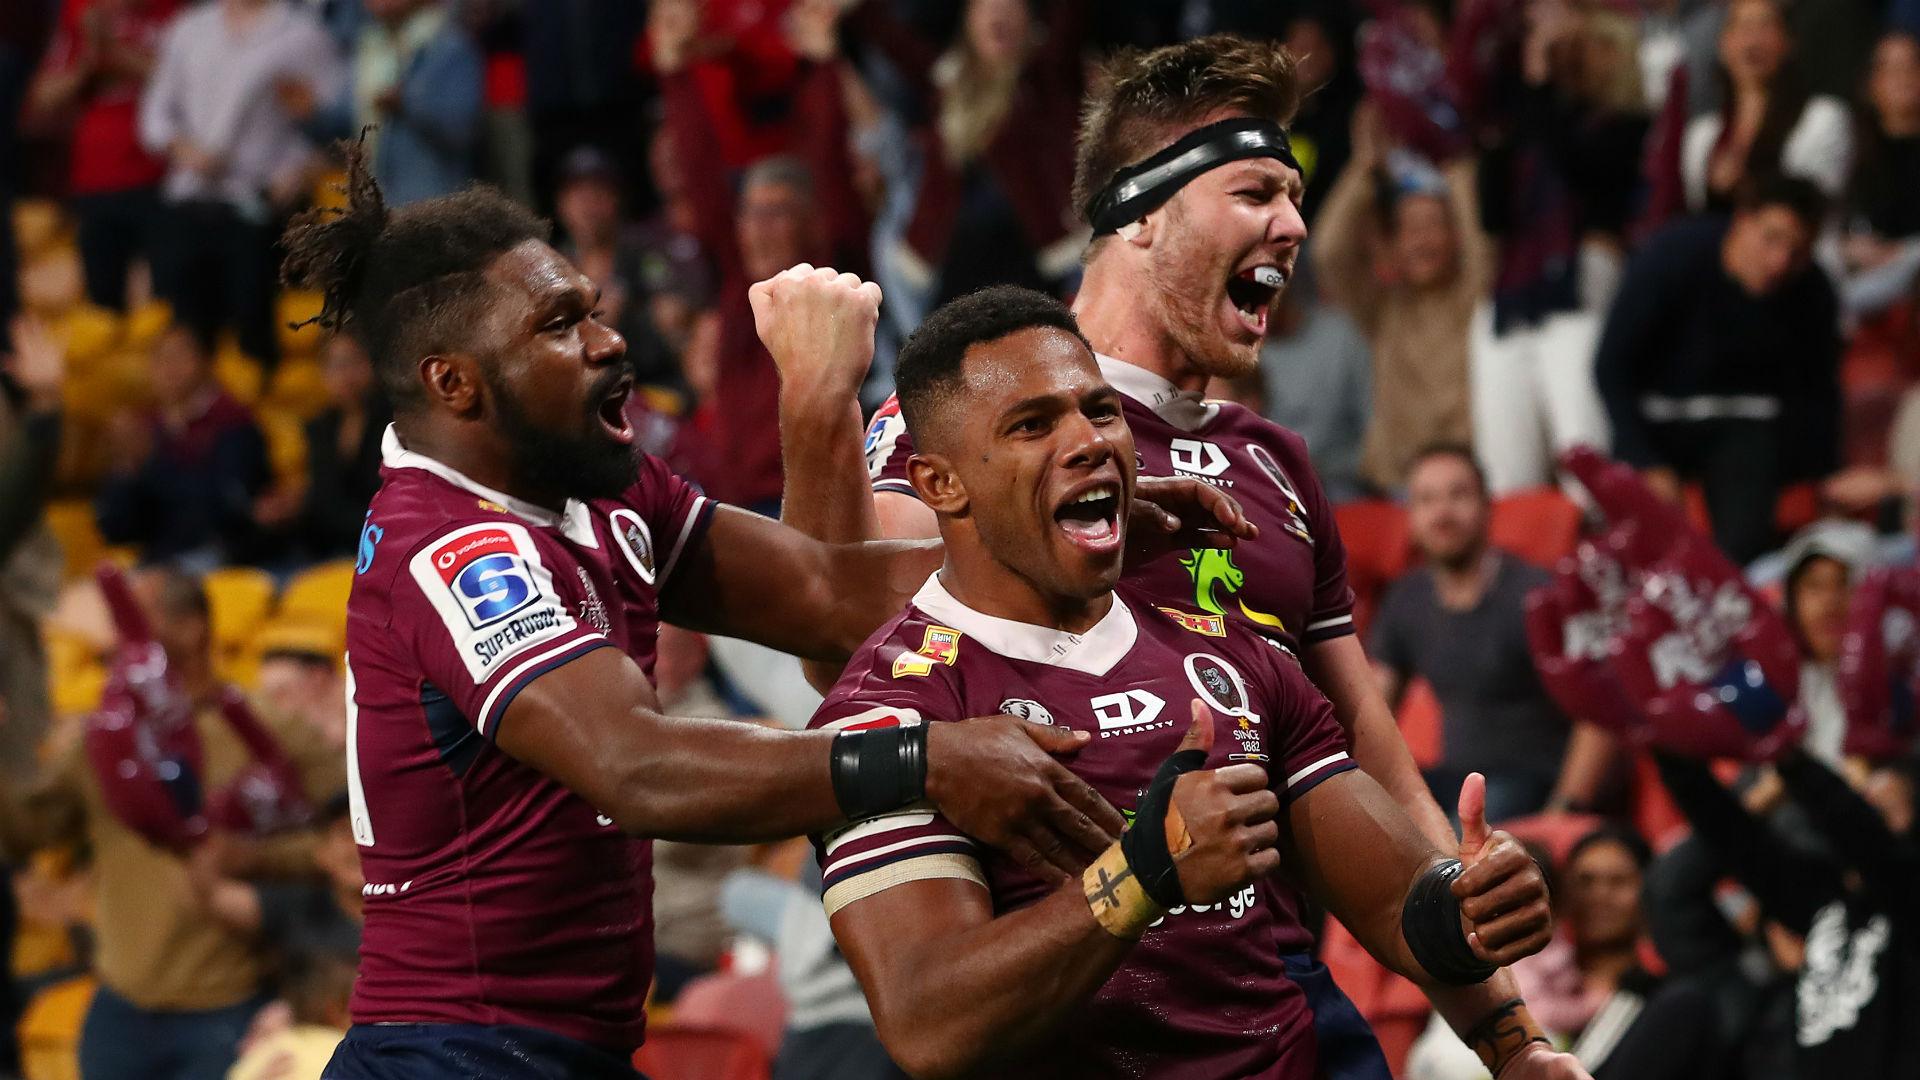 Reds 25-13 Rebels: Brumbies await in Super Rugby AU final